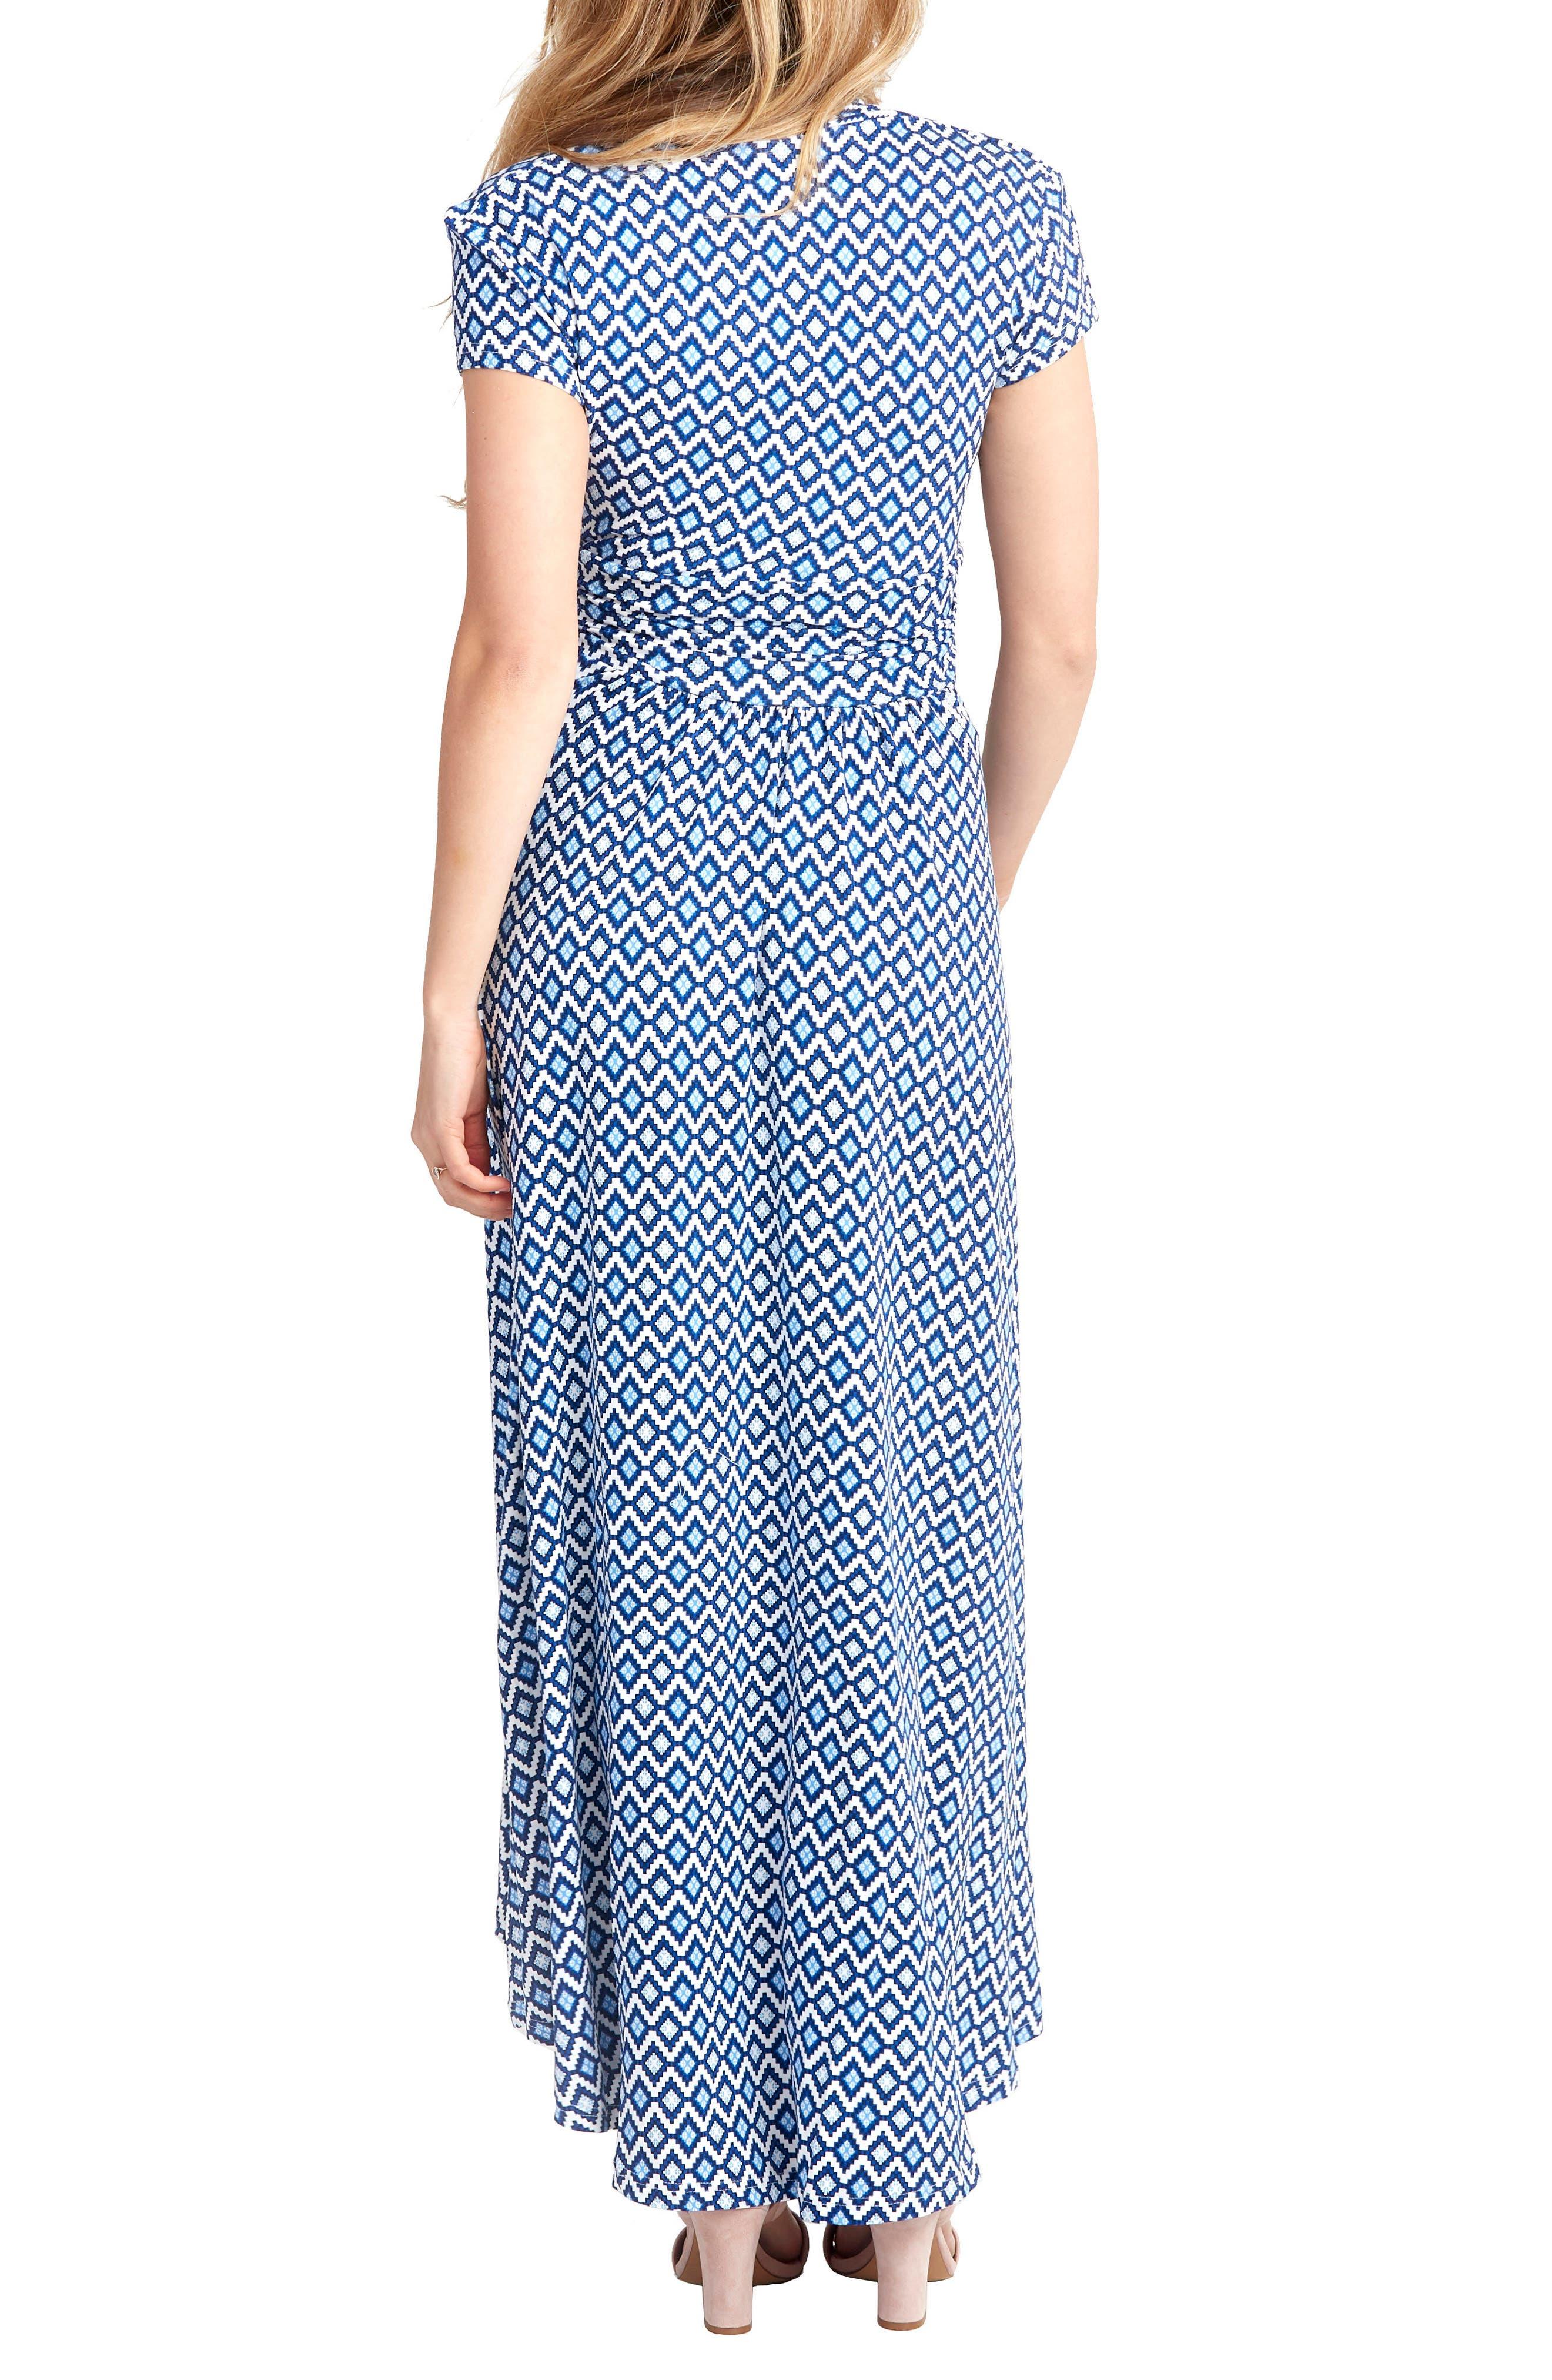 'Caroline' Maternity/Nursing Maxi Dress,                             Alternate thumbnail 2, color,                             BLUE GEO